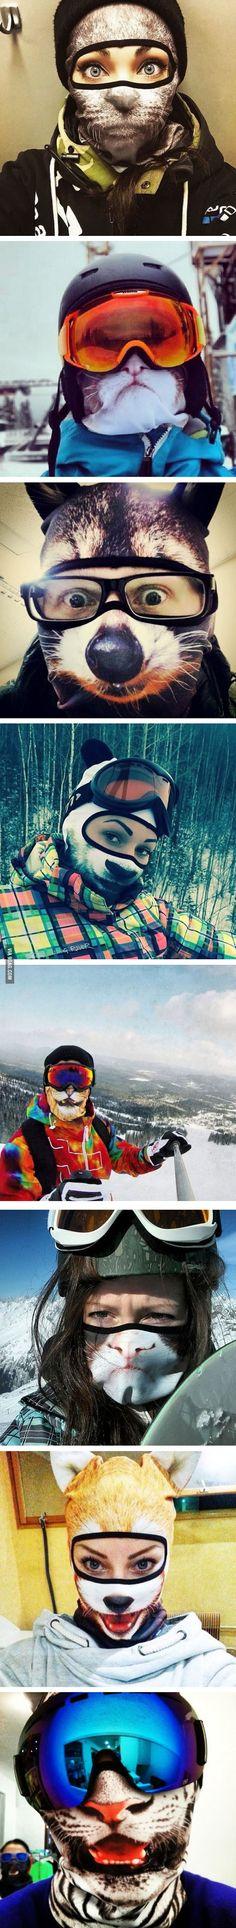 Animal Ski Masks By Teya Salat - 9GAG